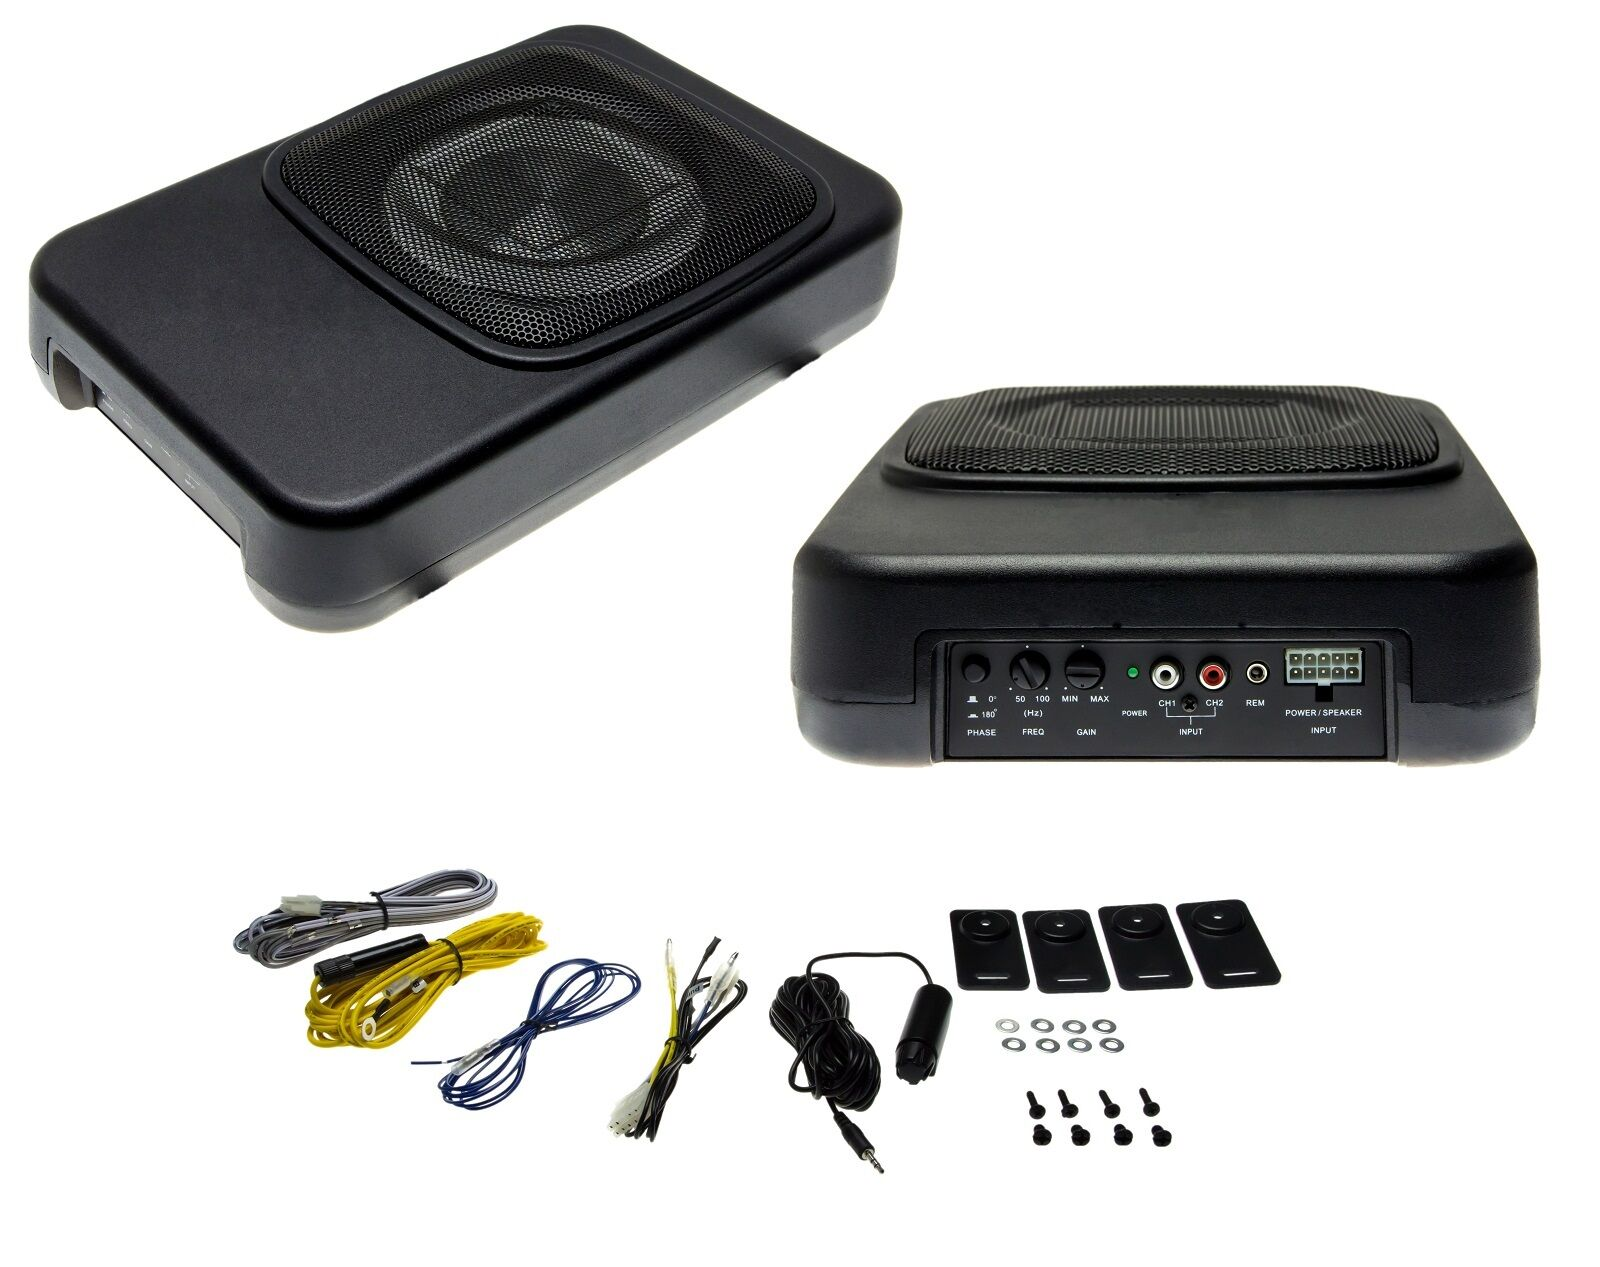 auto subwoofer actif 20cm 8 zoll hifi voiture haut parleur 180w basse box ebay. Black Bedroom Furniture Sets. Home Design Ideas